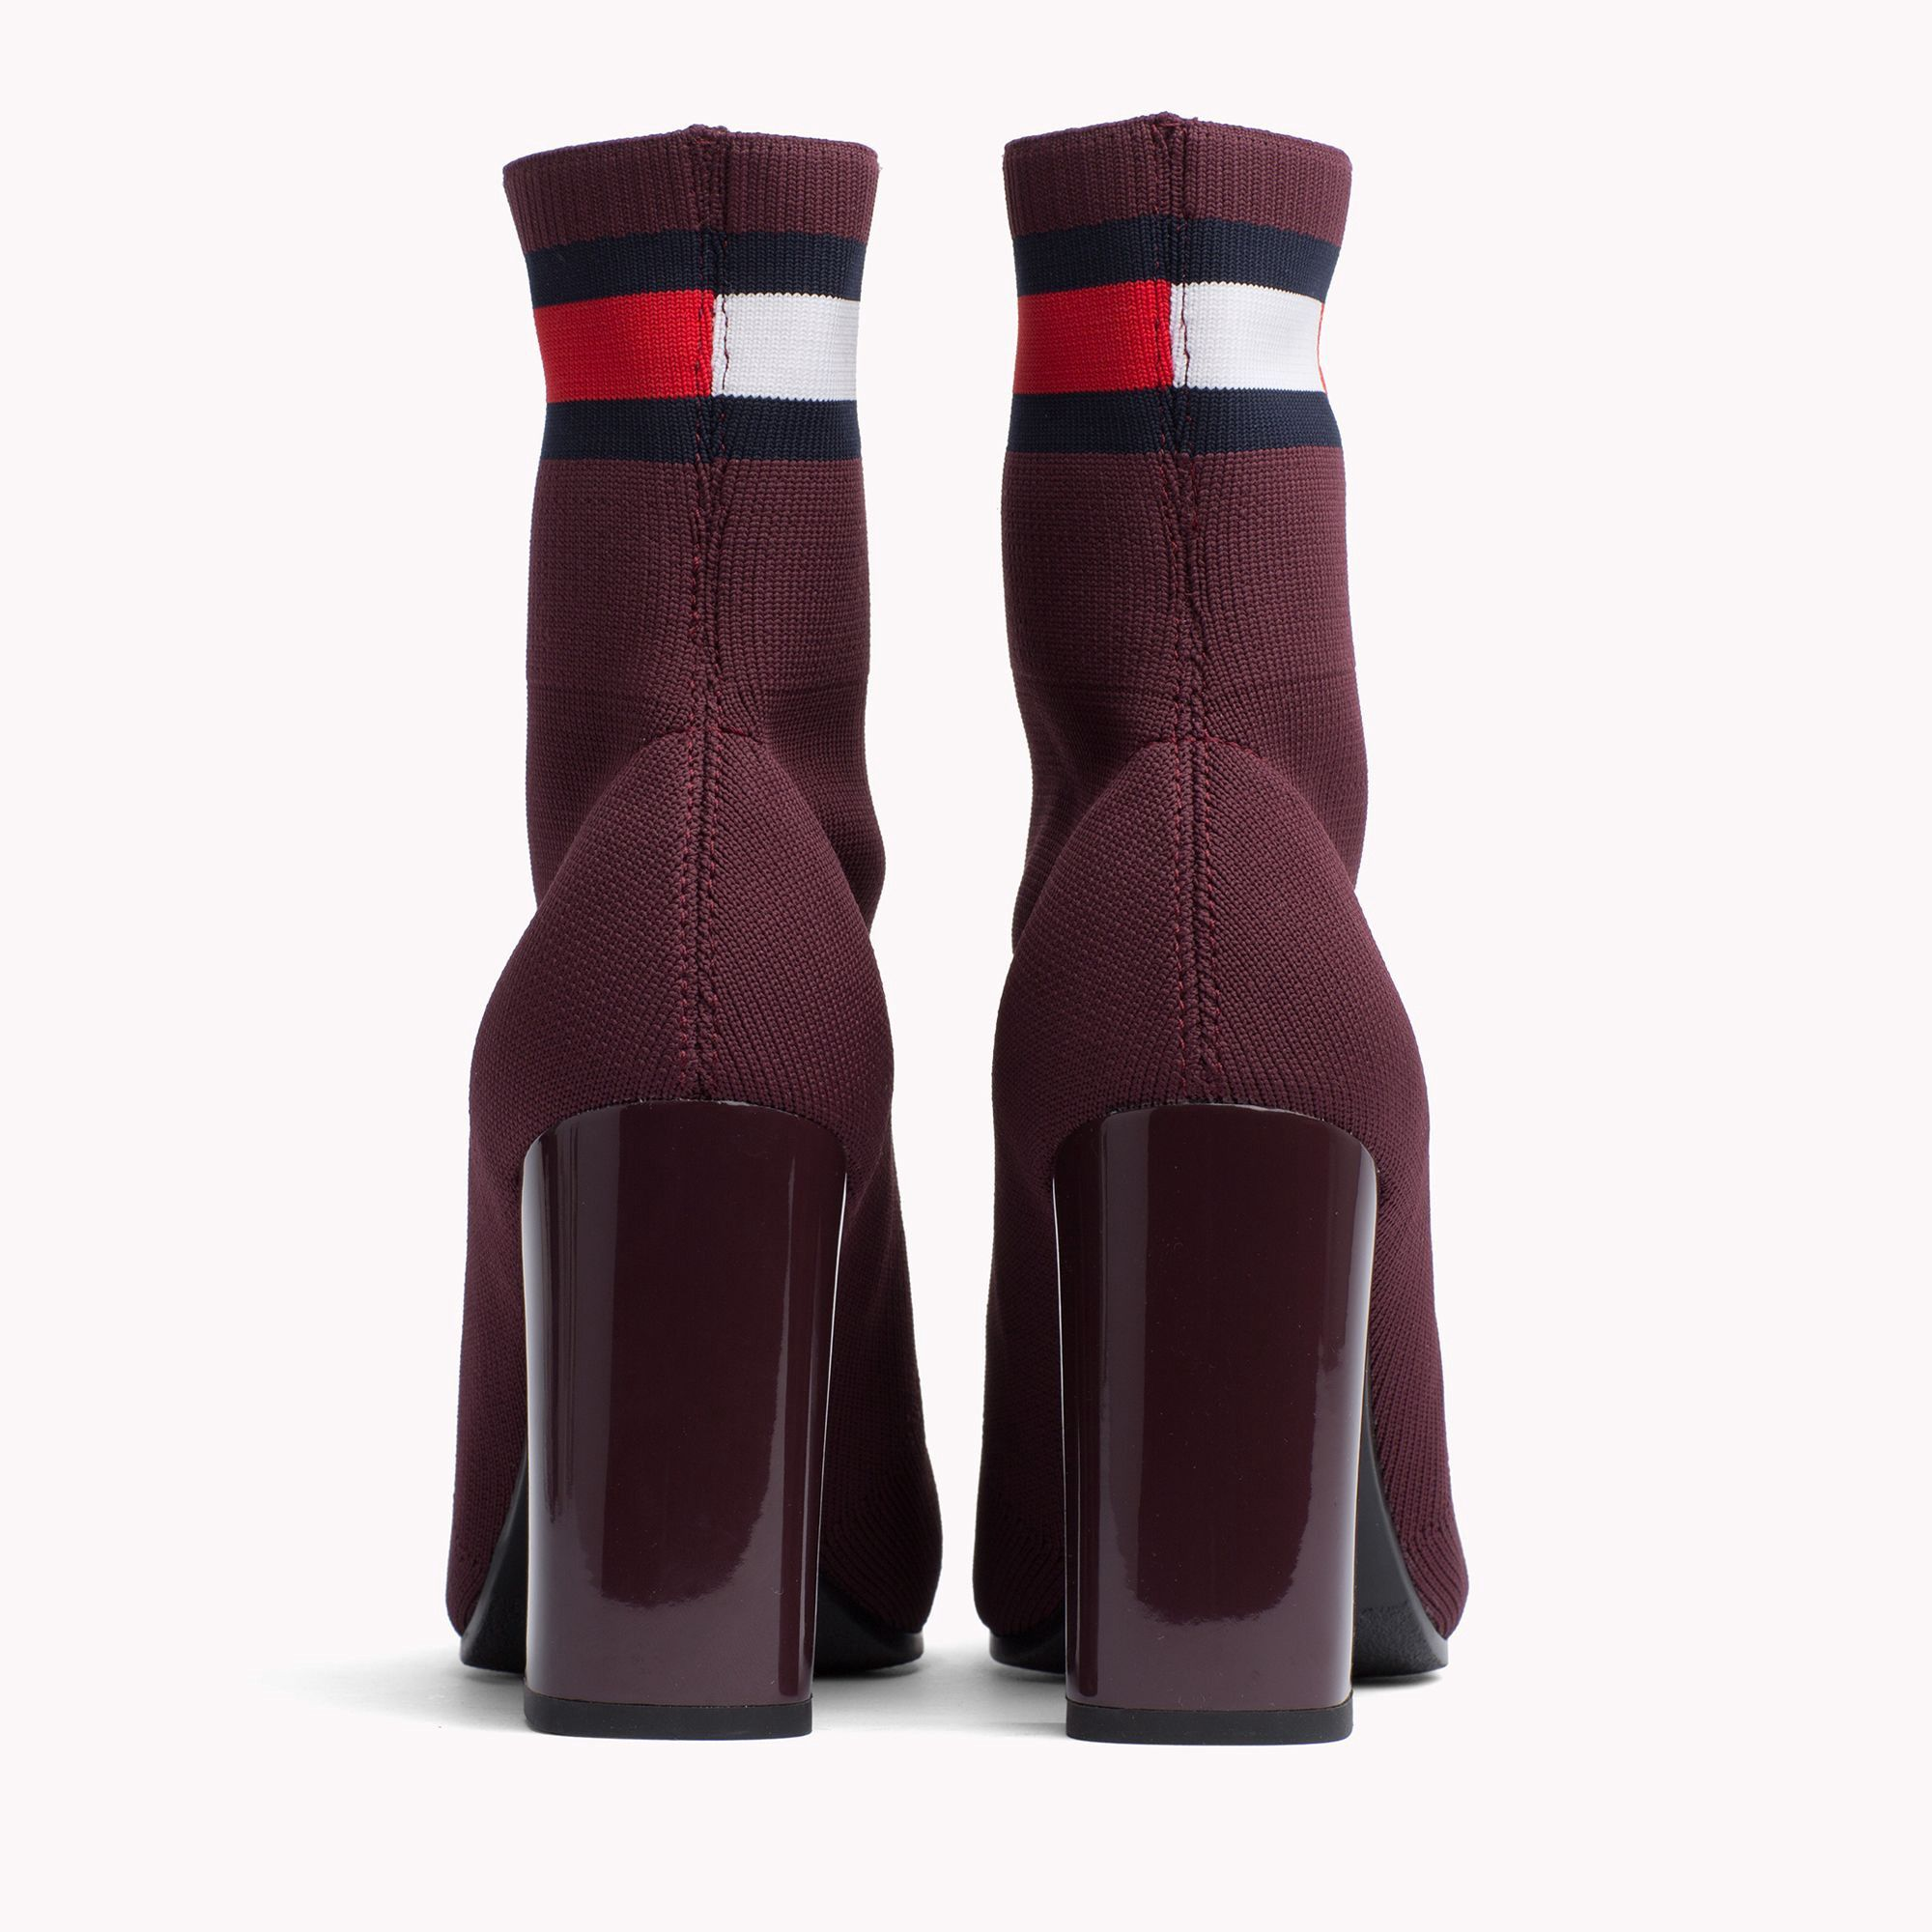 16c171362dcb2 Tommy Hilfiger Sock Heeled Boot - Black 8.5